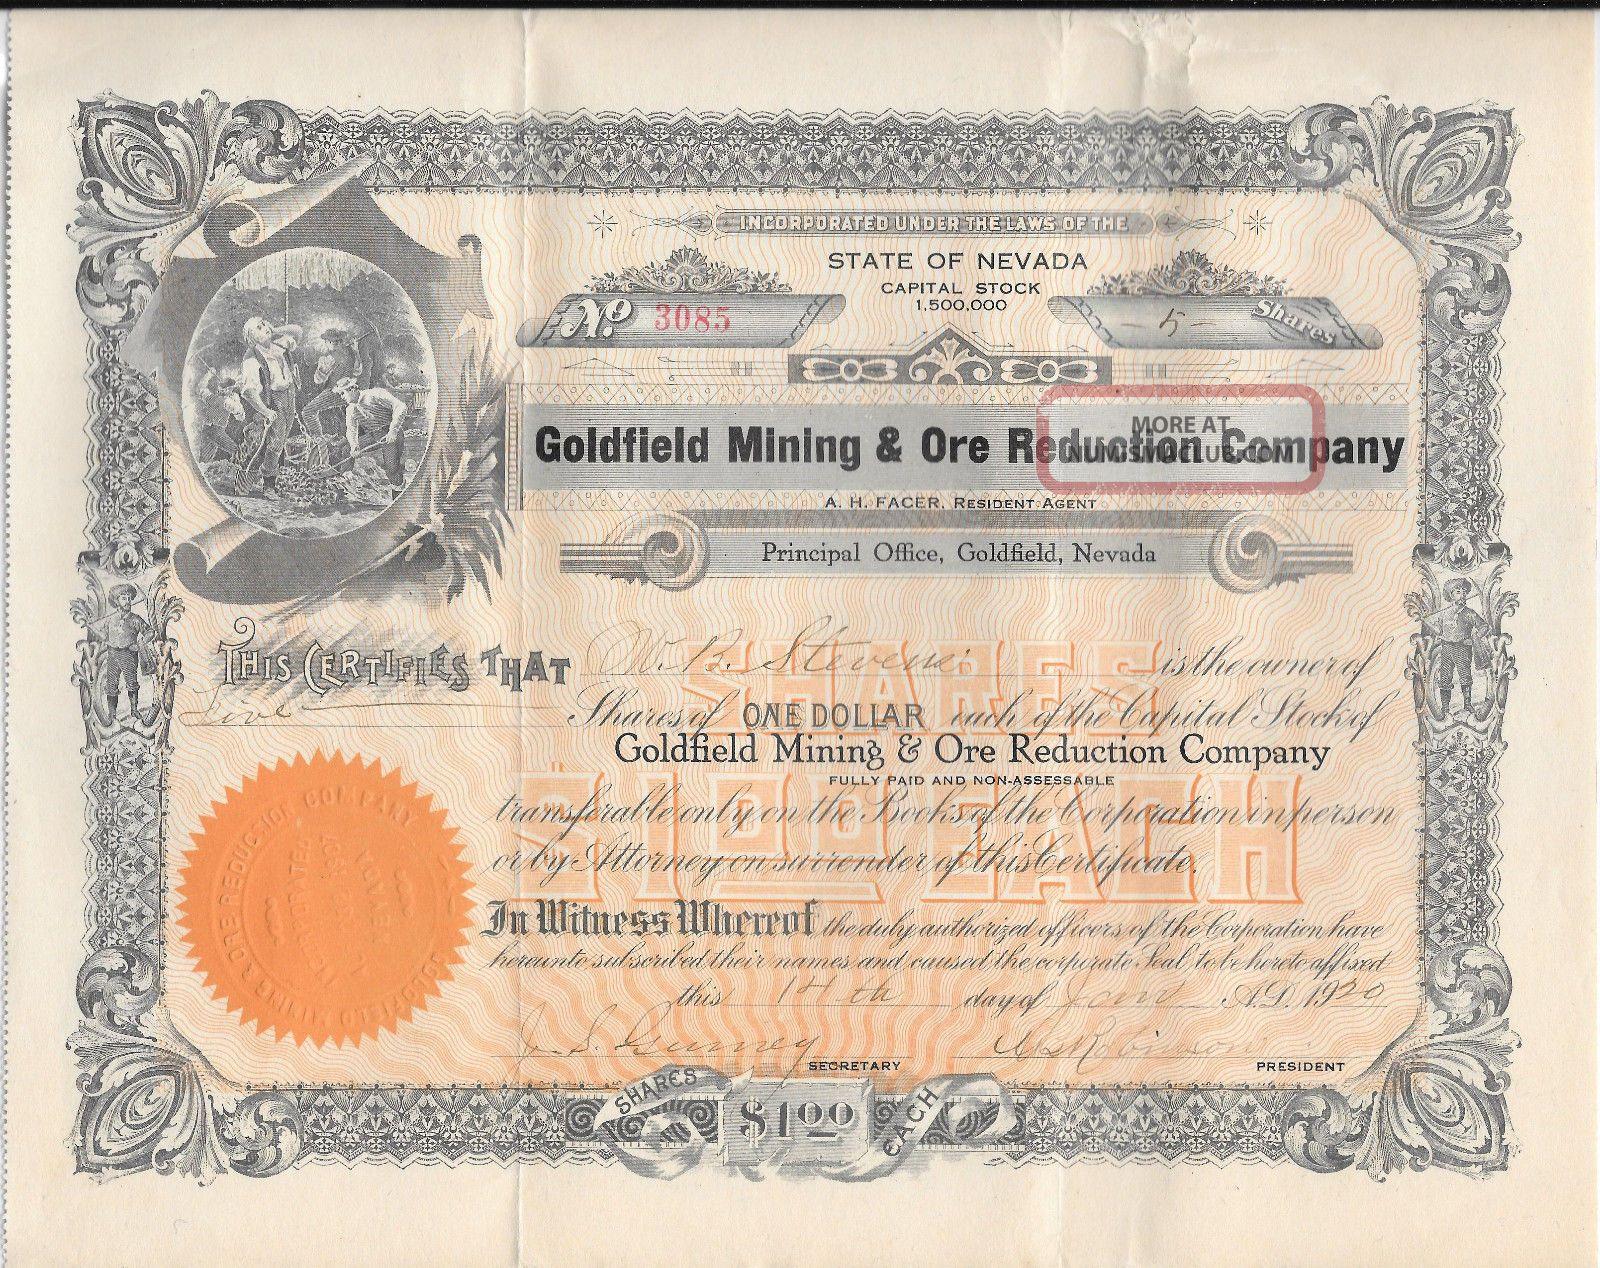 1920 Stock Certificate,  Goldfield Mining & Ore Reduction Co. ,  Goldfield,  Nevada Stocks & Bonds, Scripophily photo